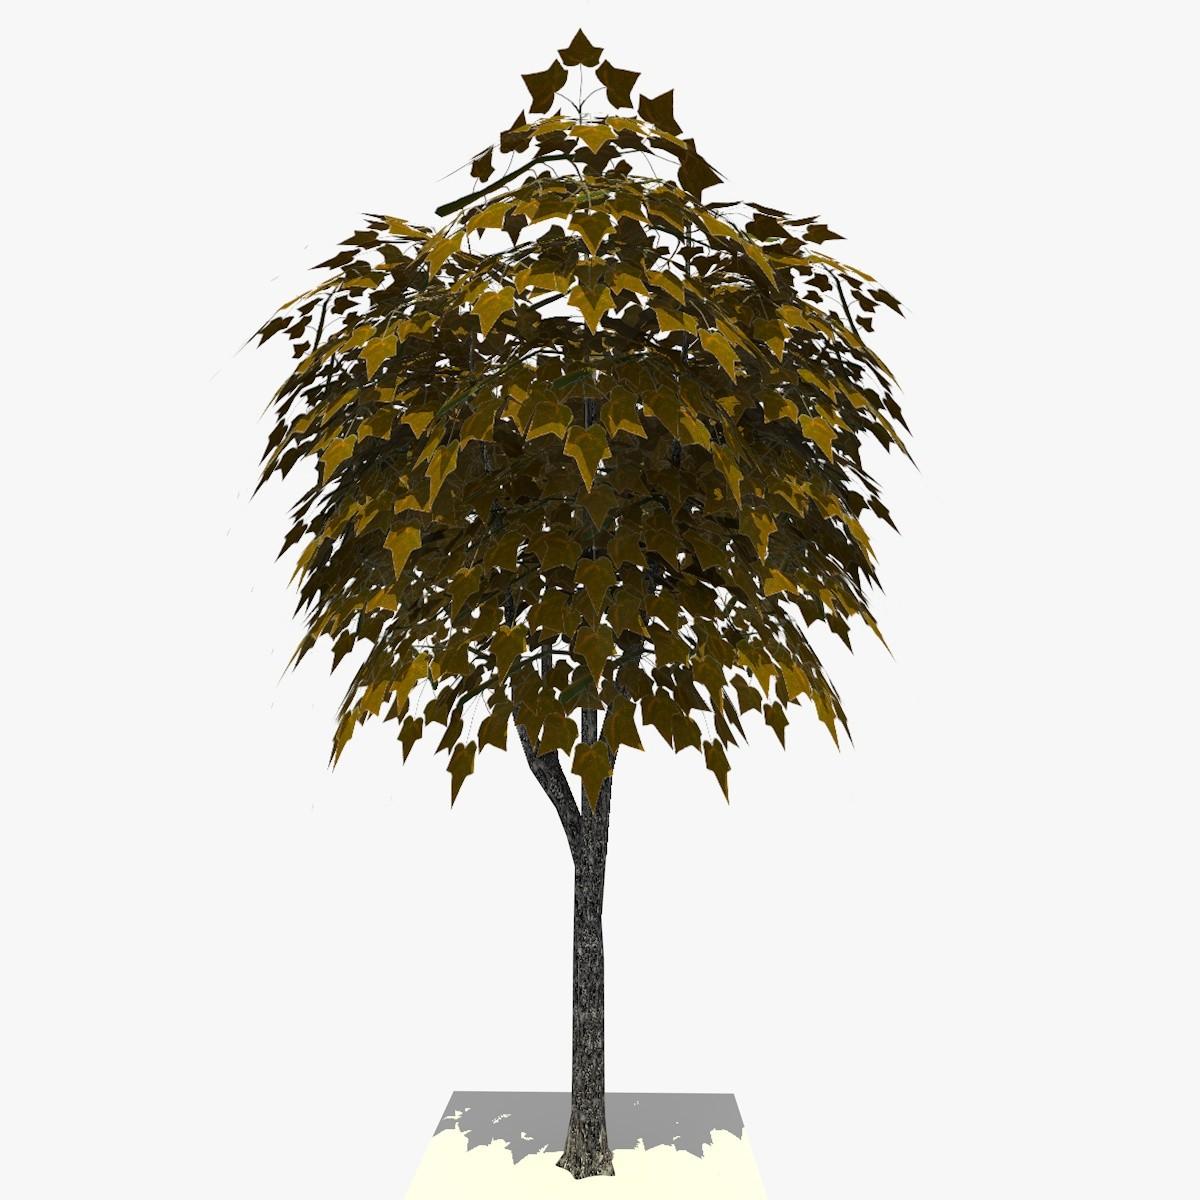 3 TREE 19 1.jpg